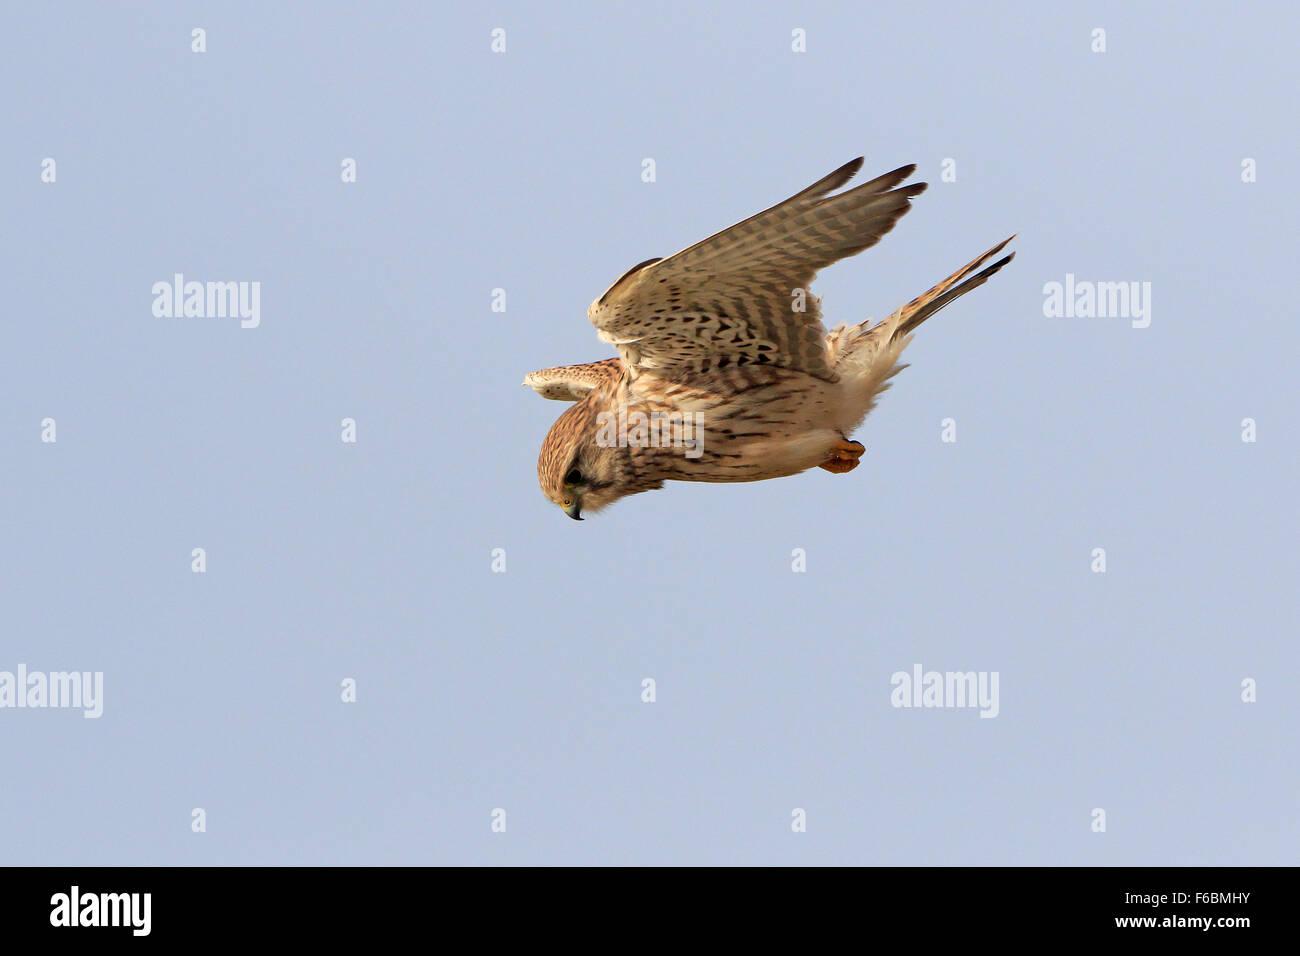 Female Common Kestrel hovering in the wind - Stock Image